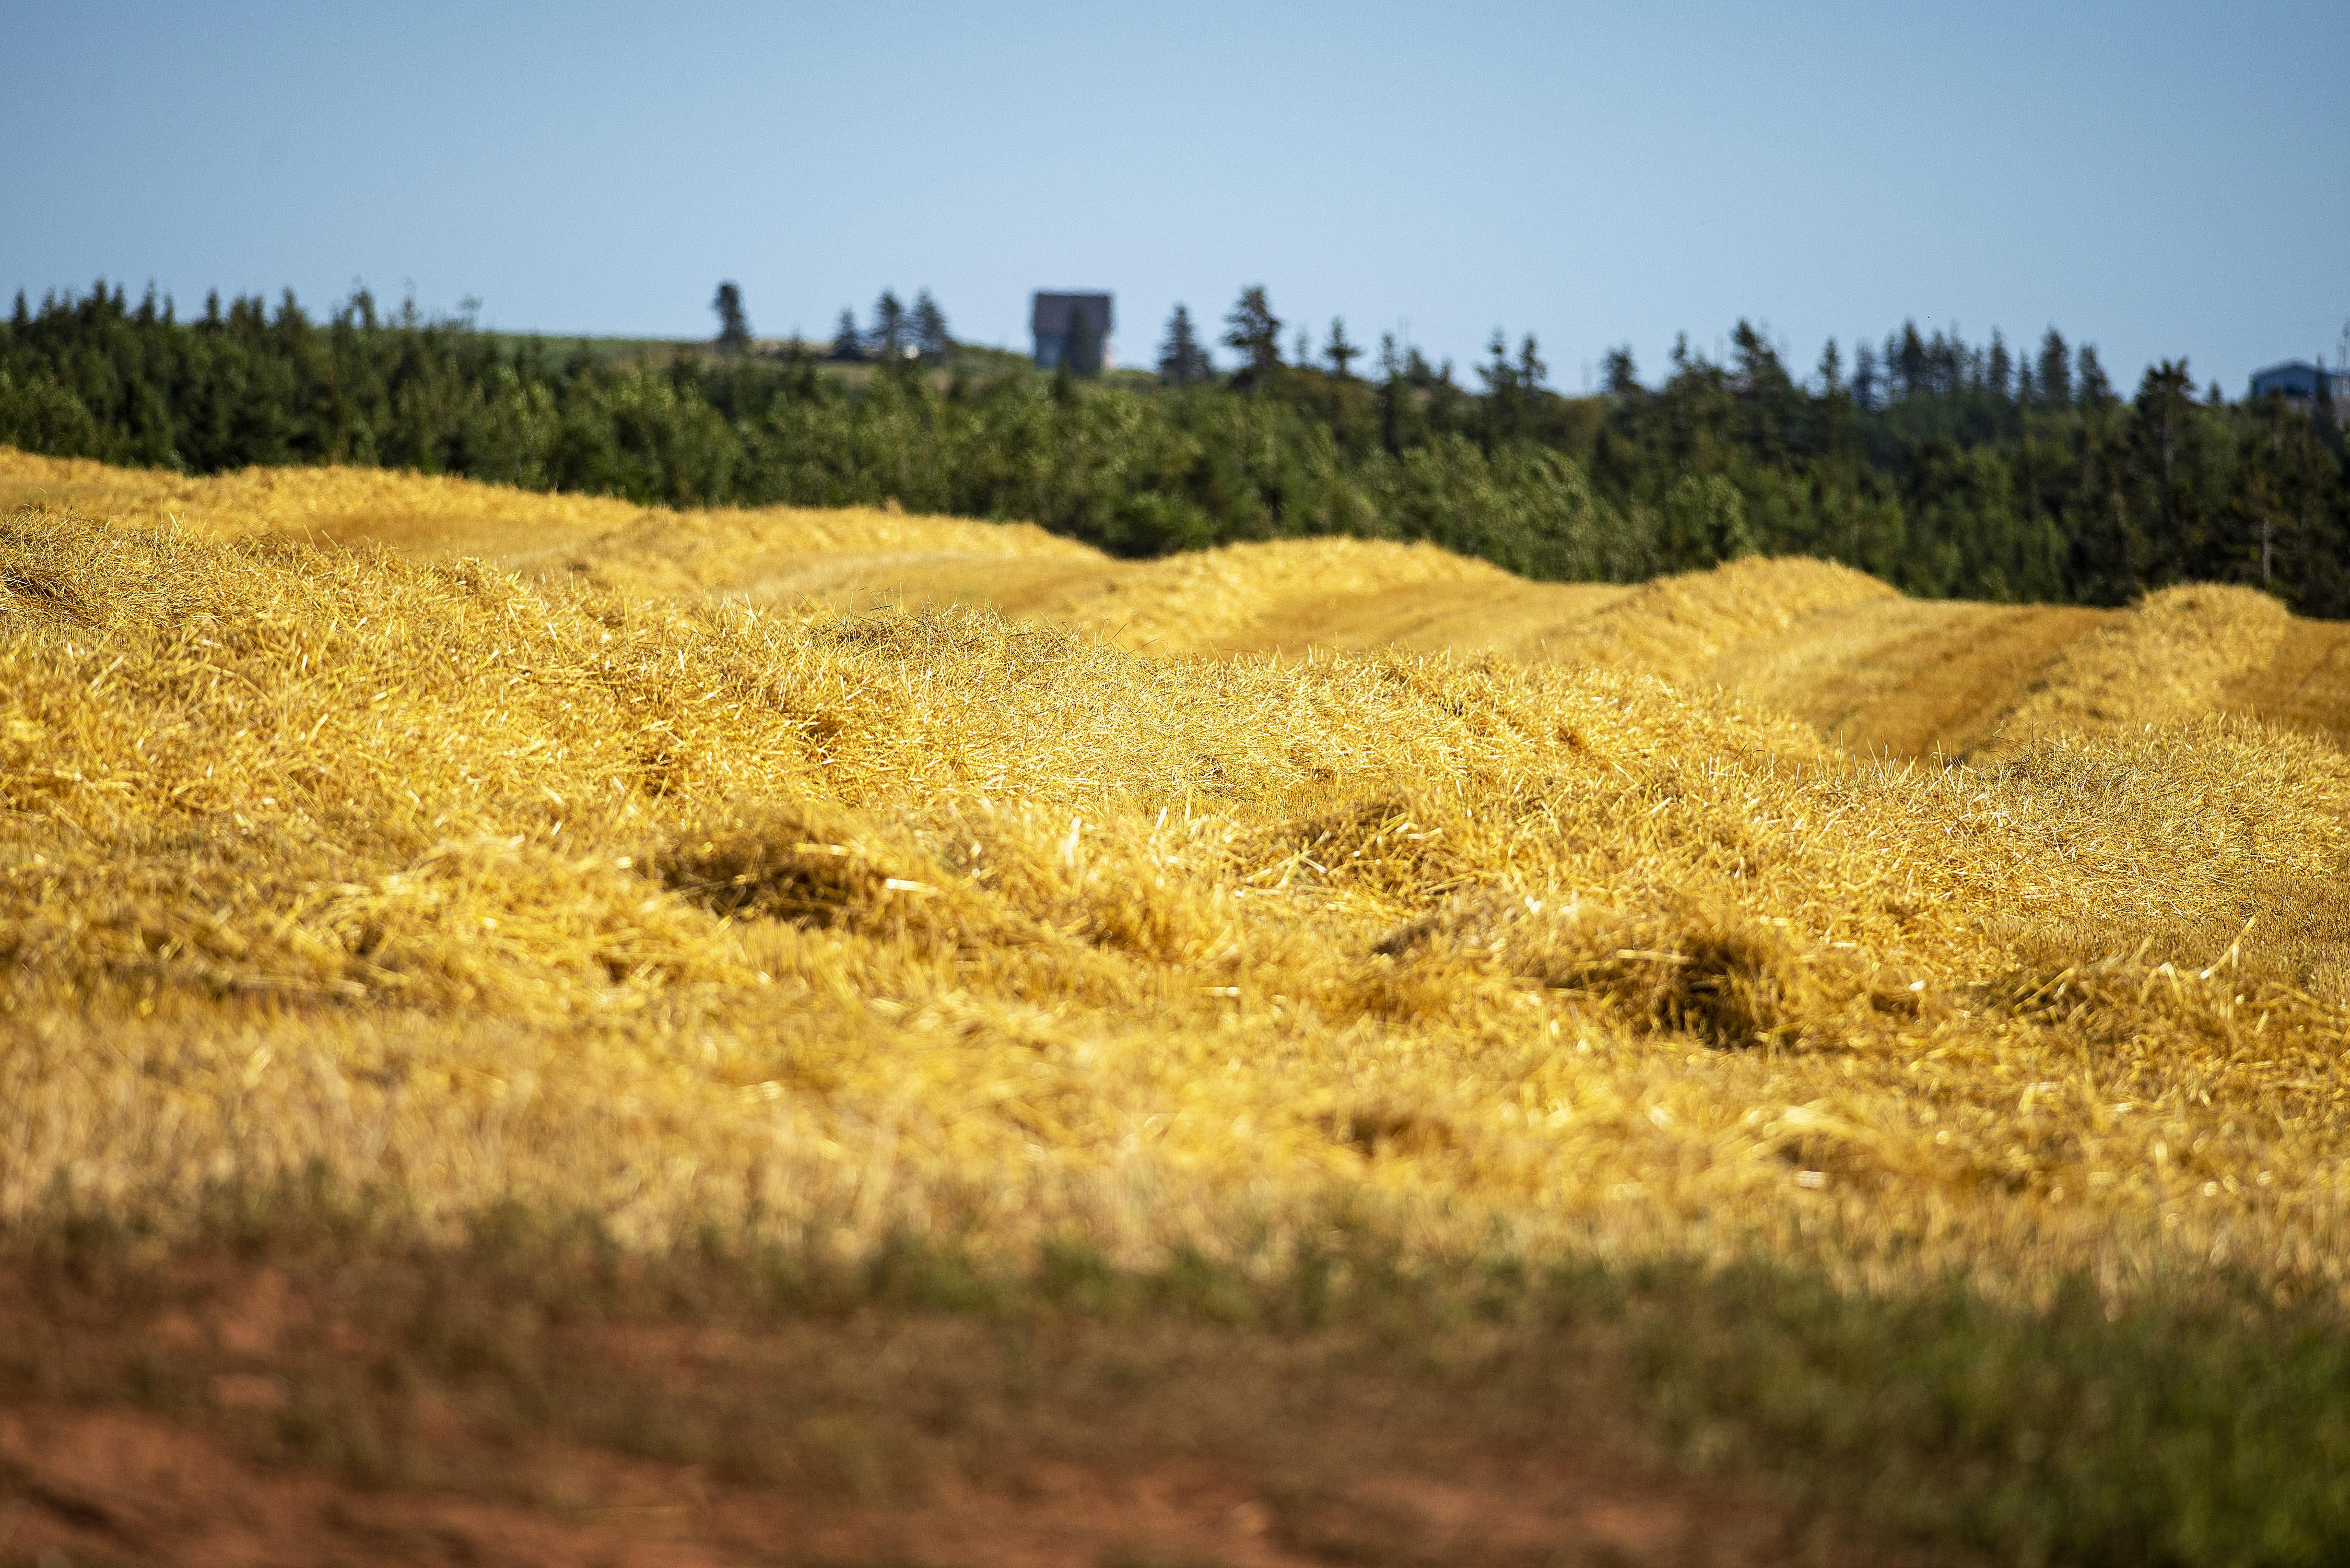 An early crop of freshly-cut straw. Brian McInnis/CBC